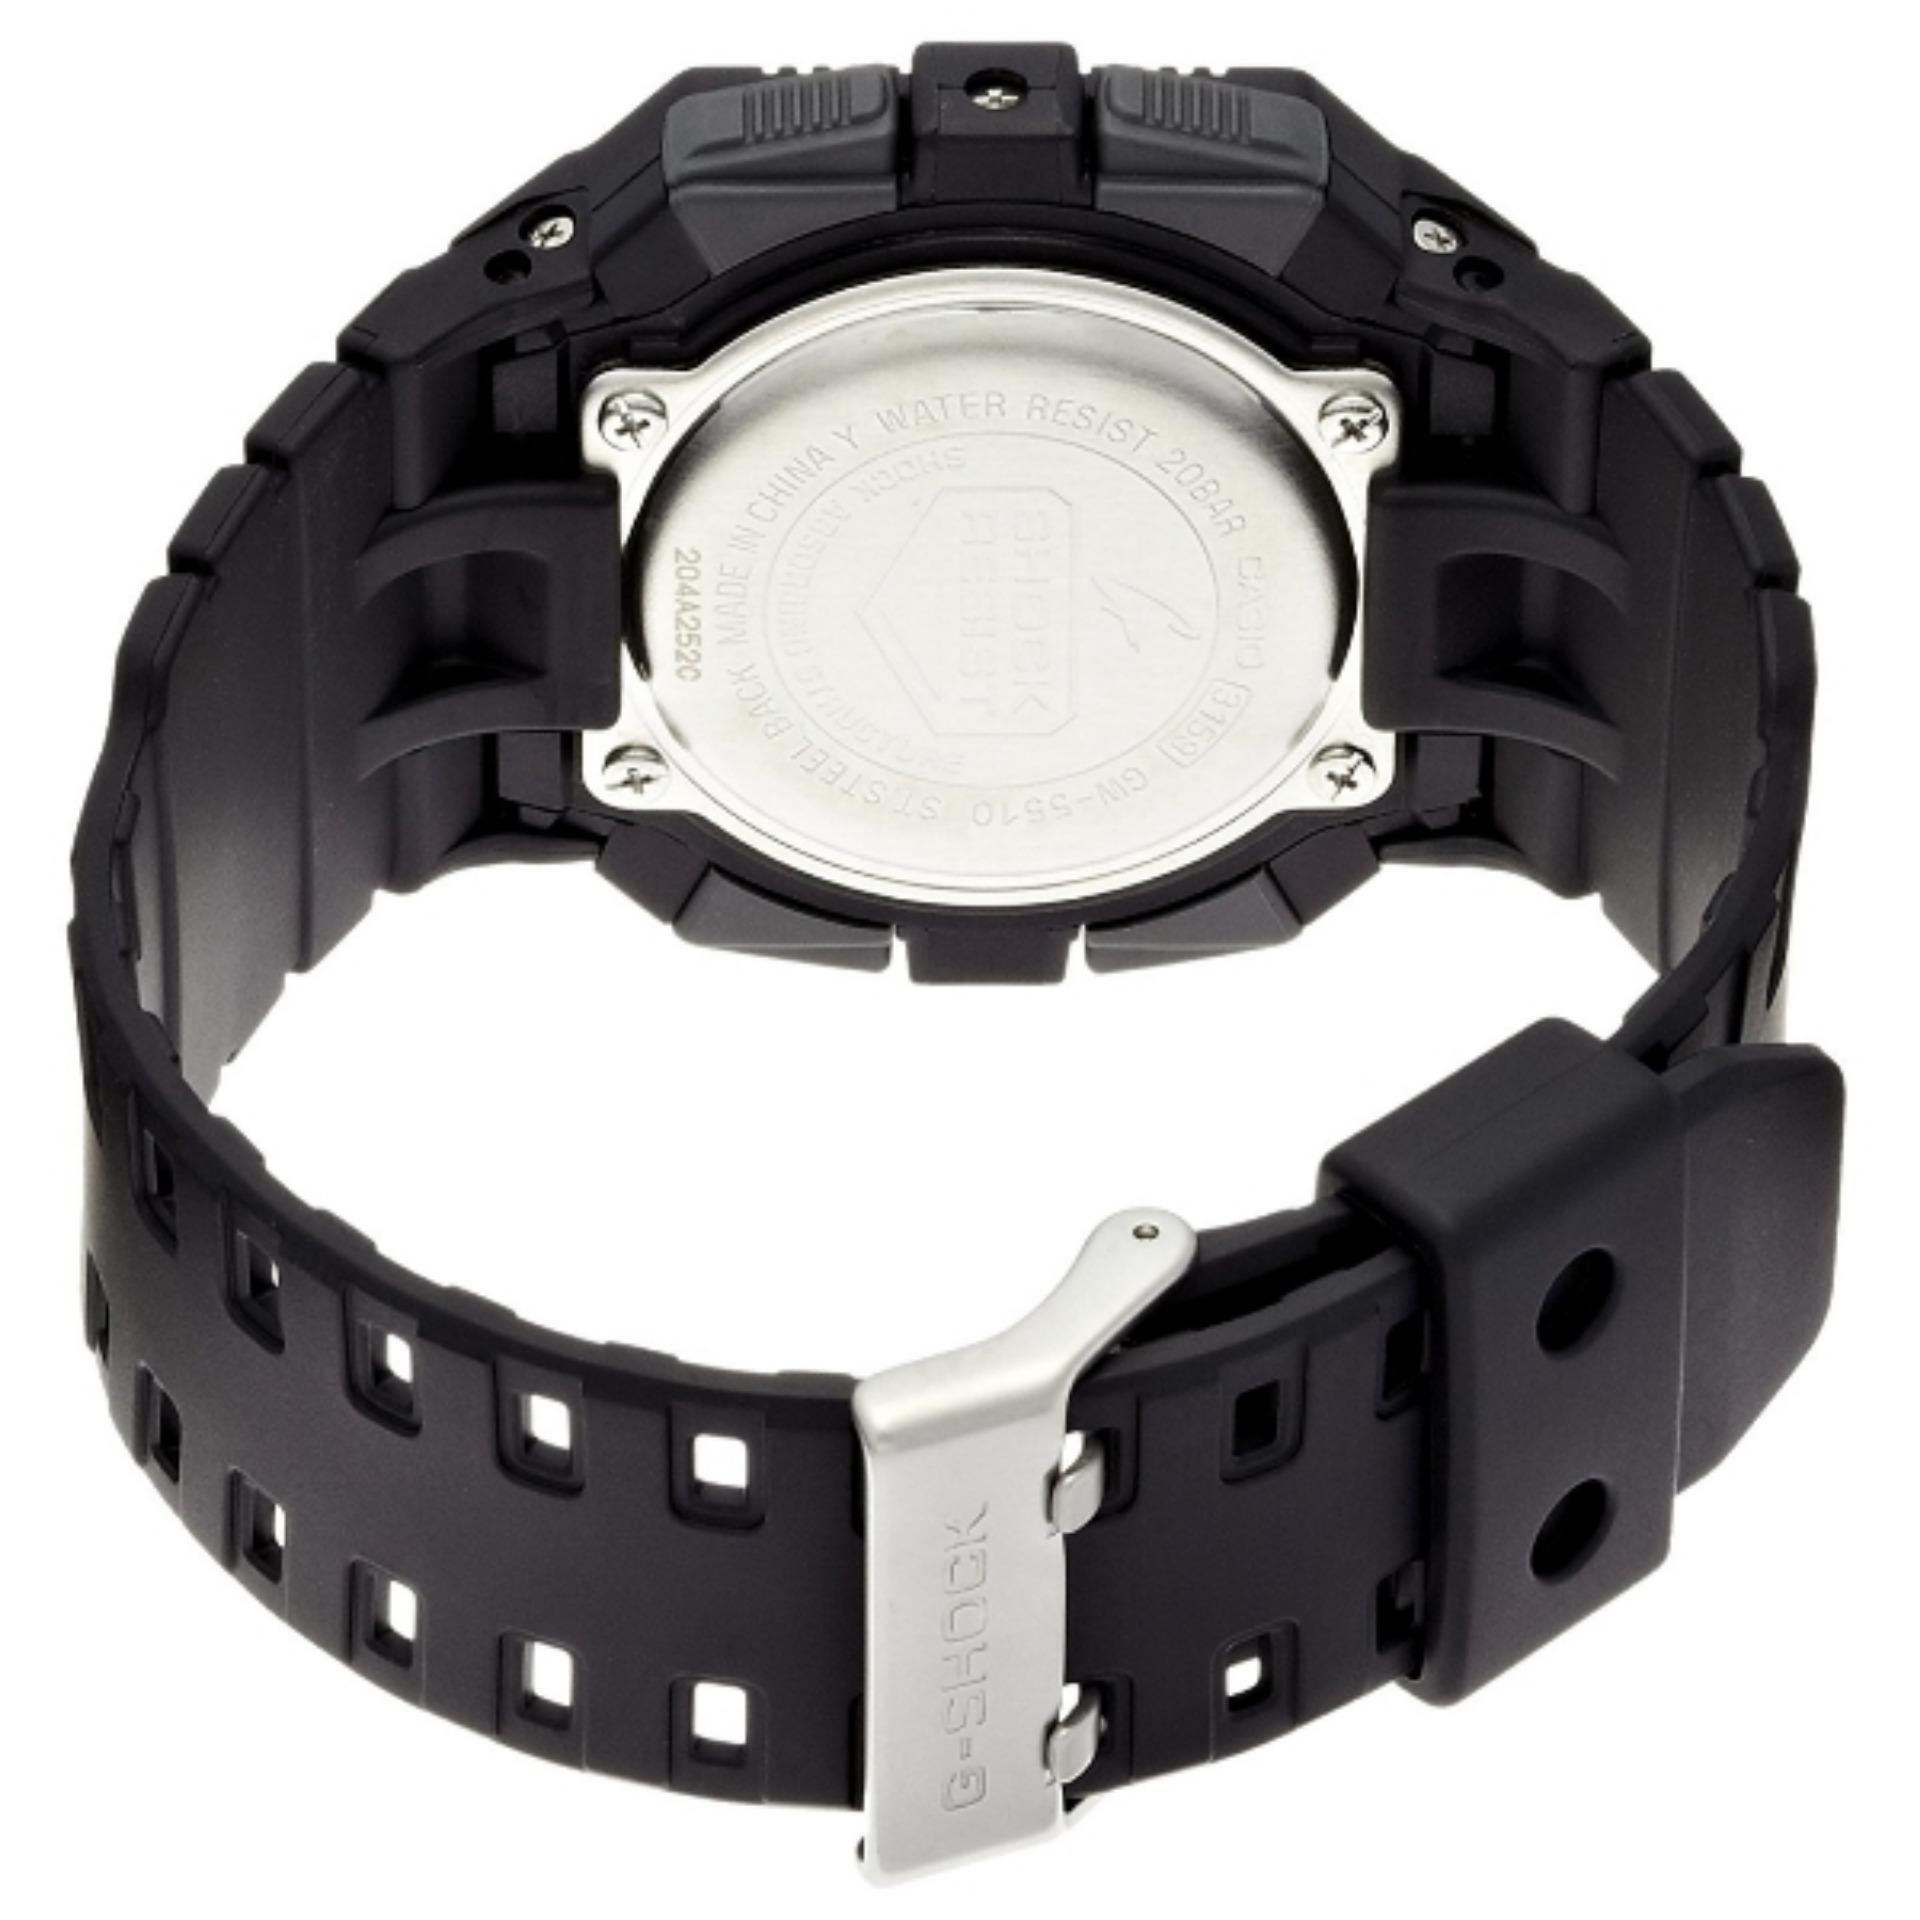 Casio Watch G Shock Multiband 6 Radio Tough Solar Gw M Jam Tangan Pria 9400 1d Rangeman Original 5510 1jf Controlled